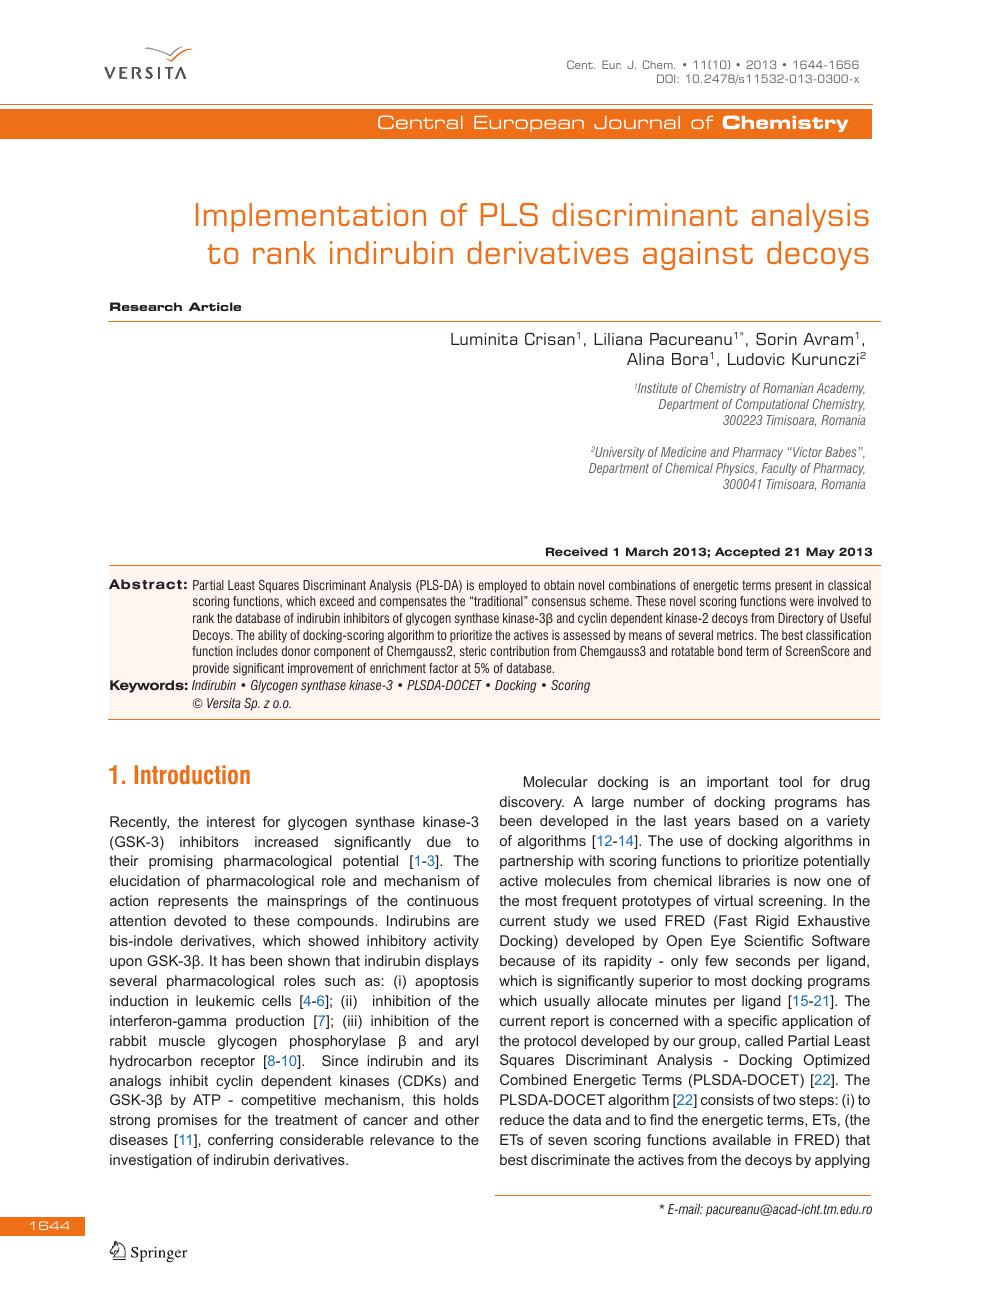 Implementation of PLS discriminant analysis to rank